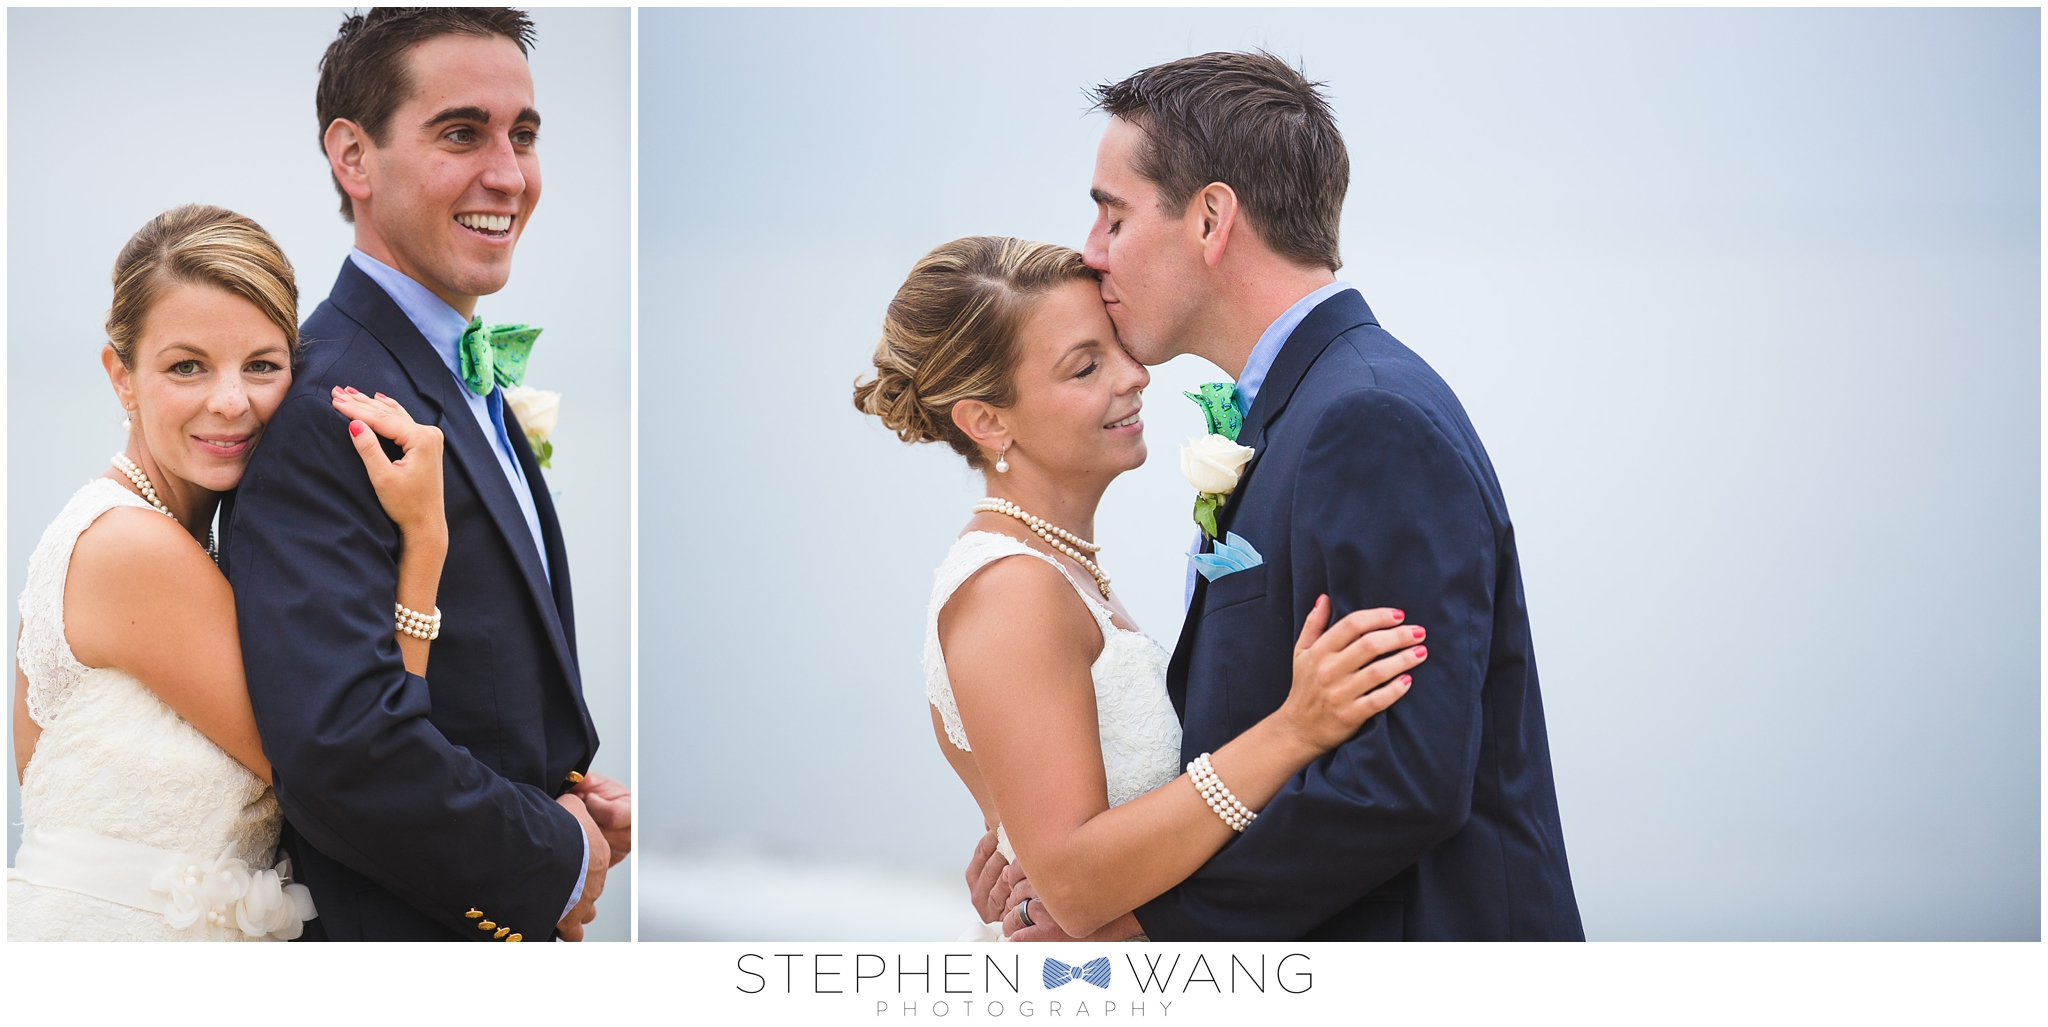 Stephen Wang Photography Madison Surf Club Wedding Photogrpahy CT Connecticut Shoreline Beach Summer Sunset -08-12_0021.jpg